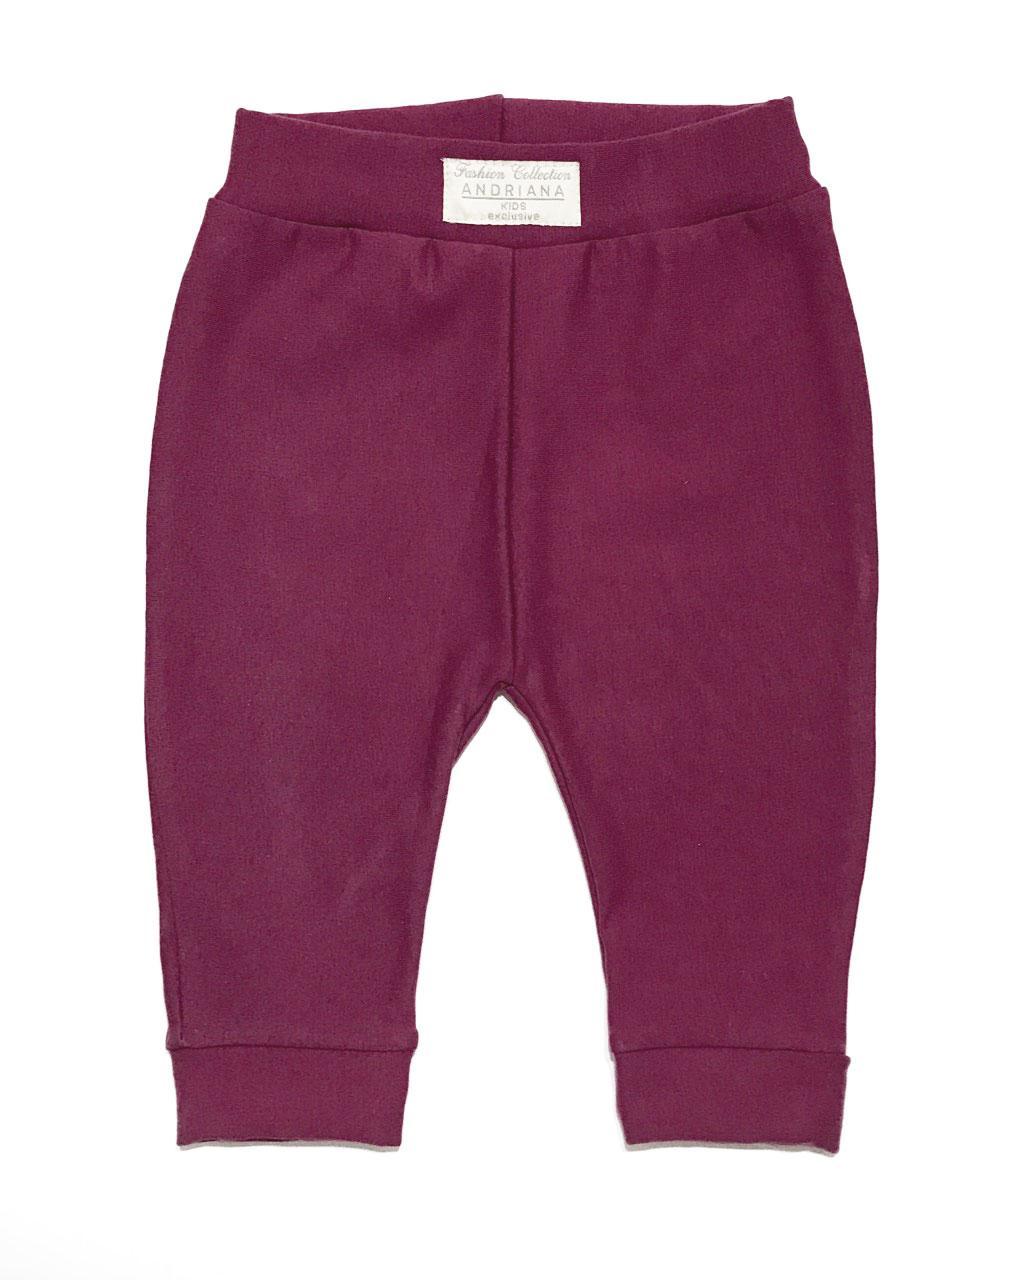 Дизайнерские штанишки 18,24,36 мес. Andriana Kids на байке